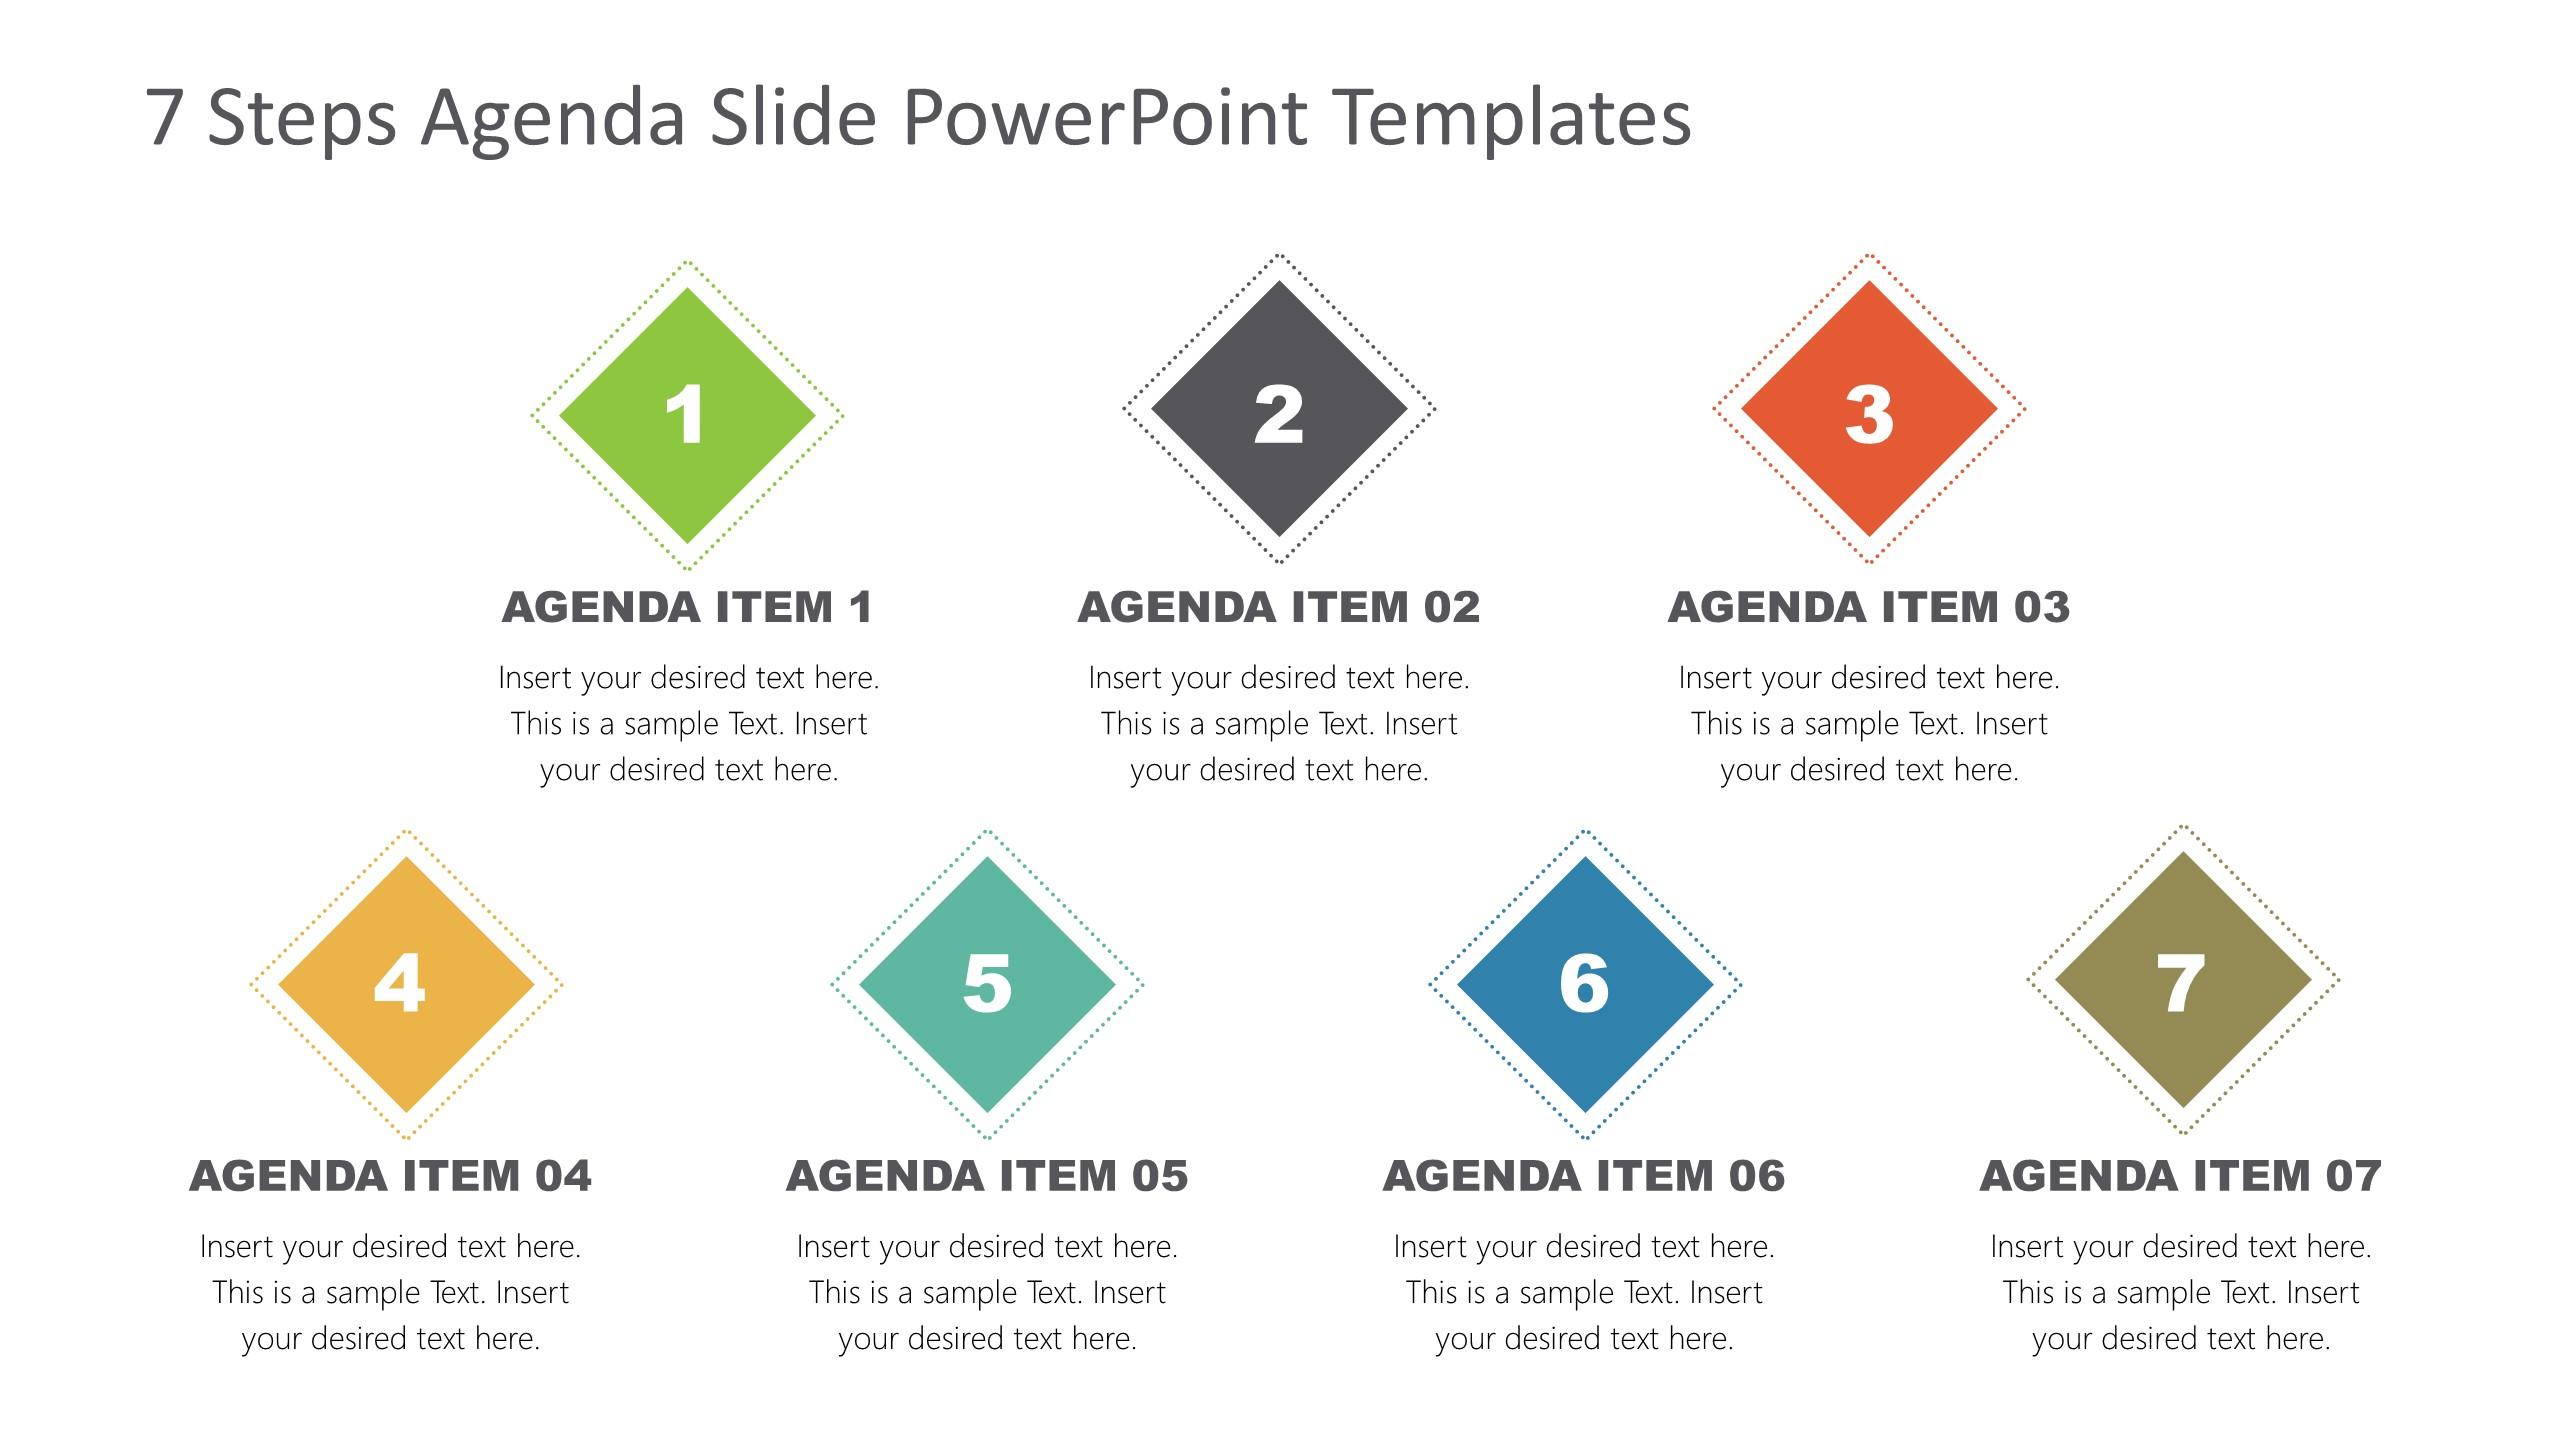 Agenda Presentation Template of 7 Items